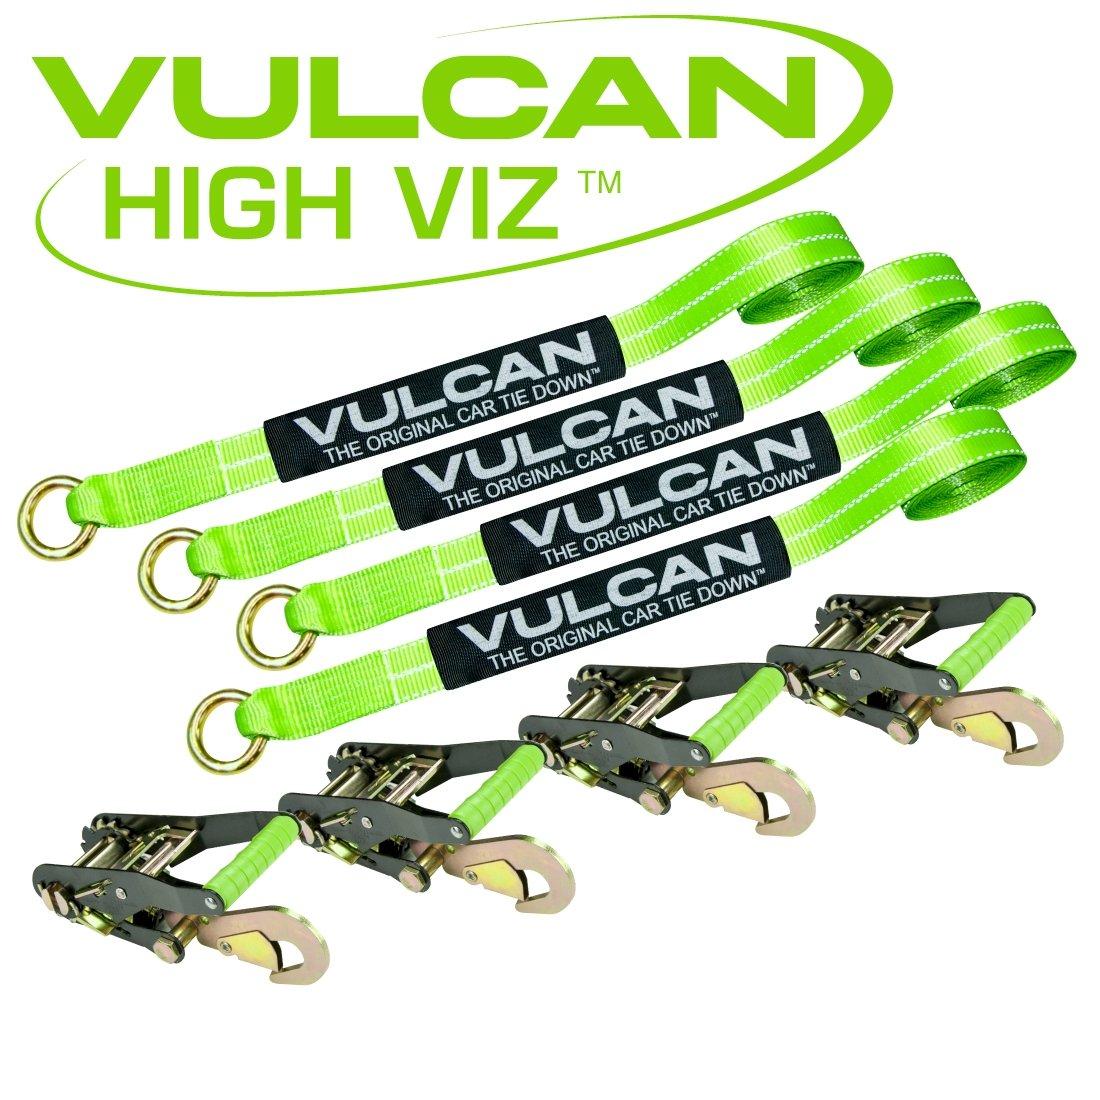 Vulcan HI-VIZ 96'' Lasso Auto Tie Down w/Snap Hooks - 3300 lbs. SWL 4 Pack by Vulcan (Image #2)